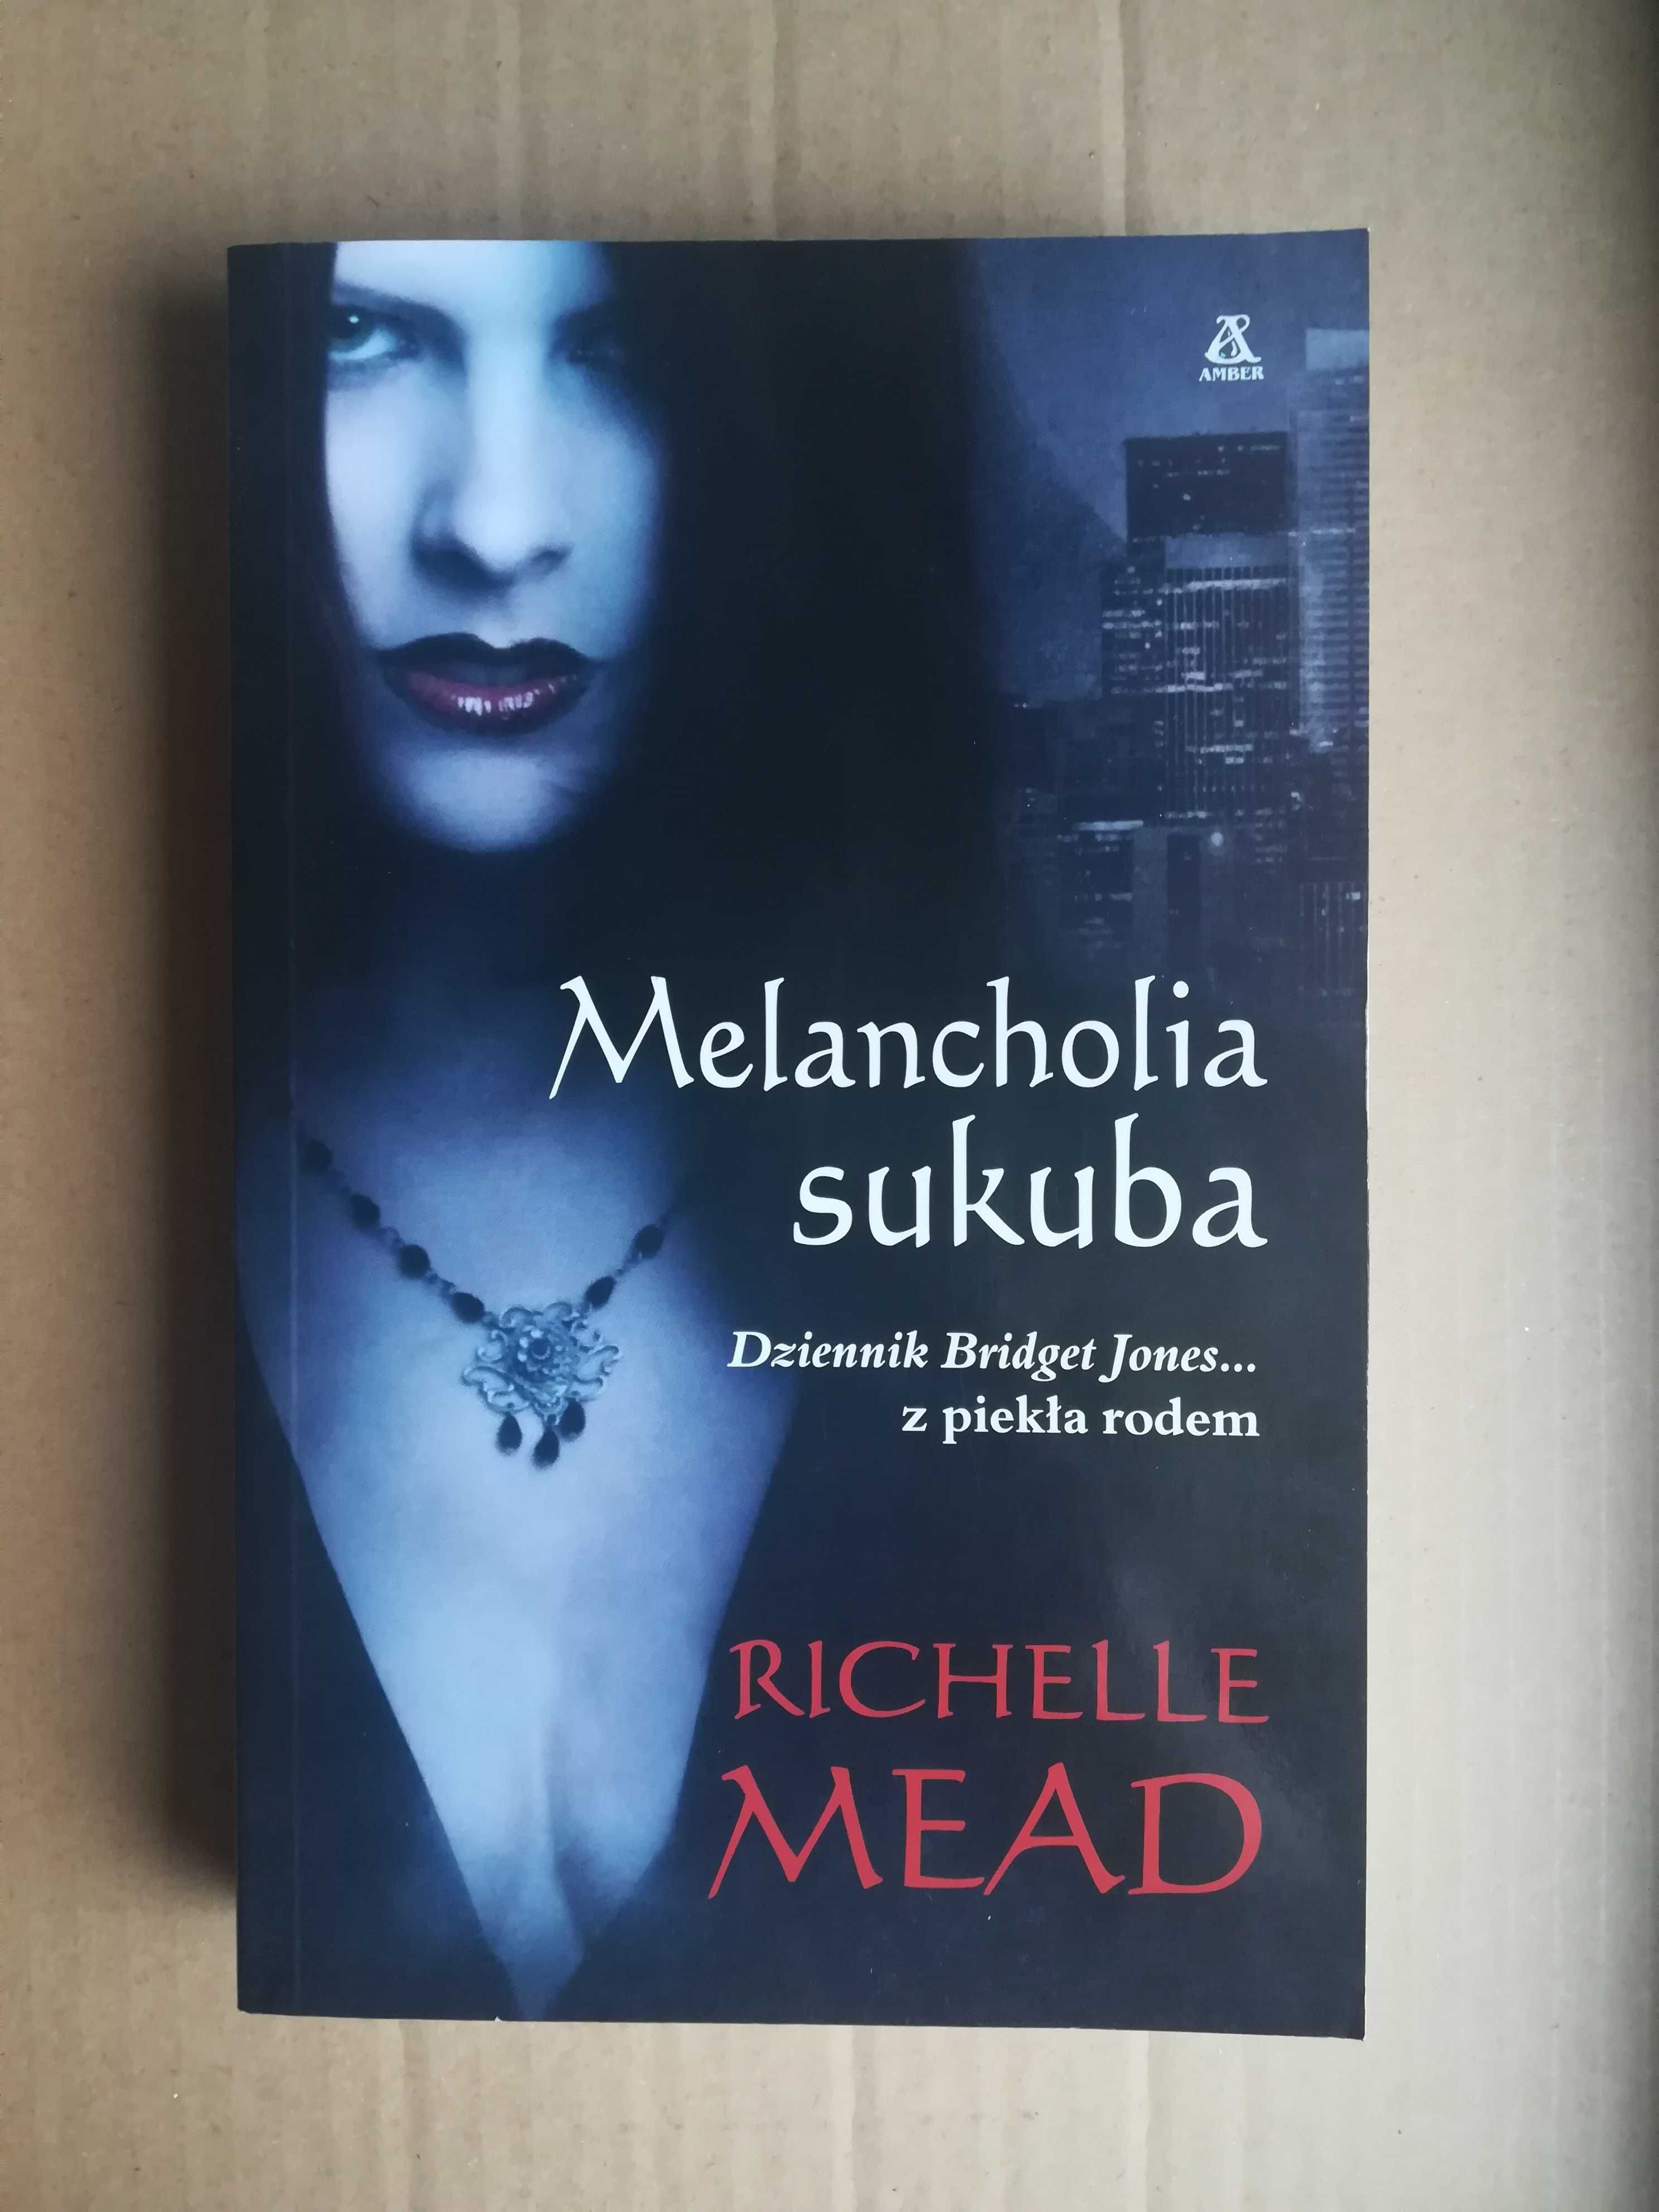 Melancholia sukuba Richelle Mead książka